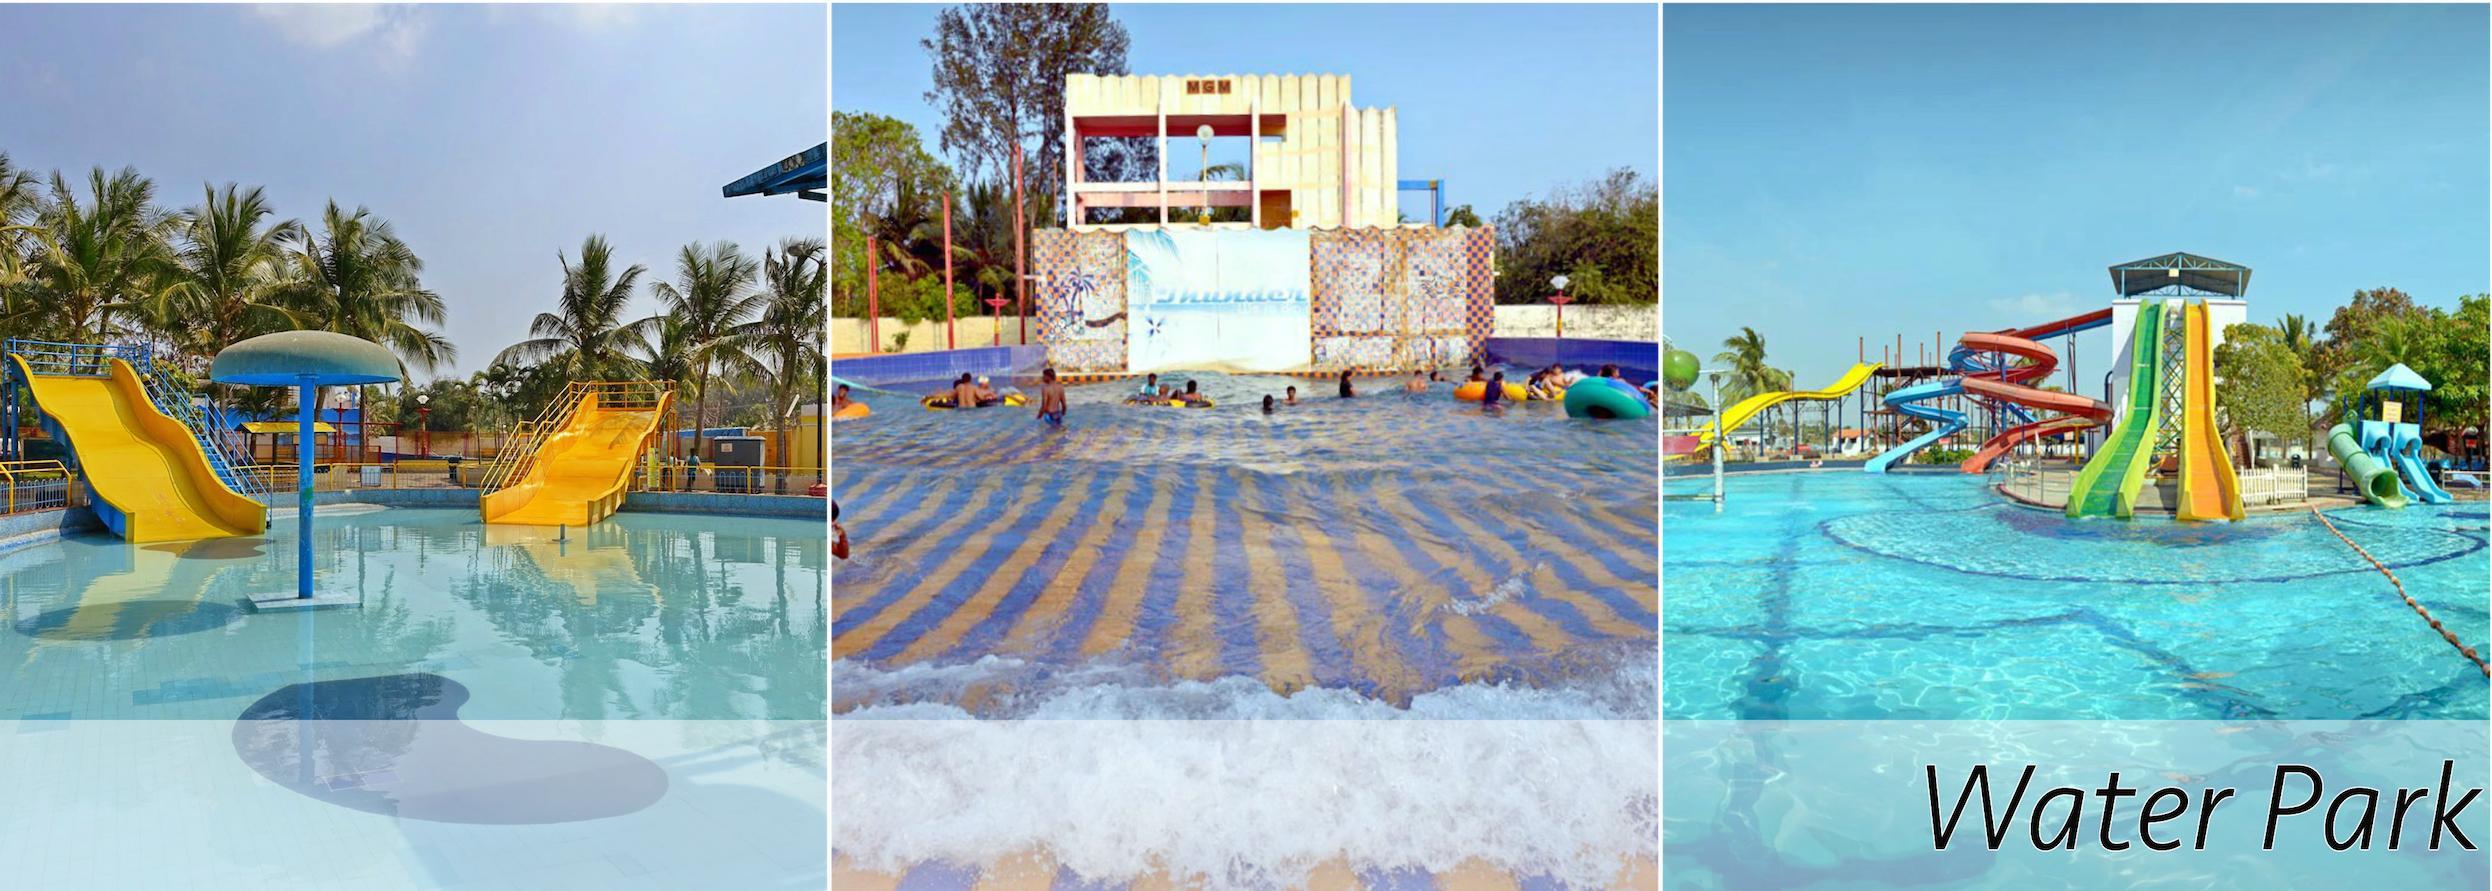 mgm dizzee world water park.jpg